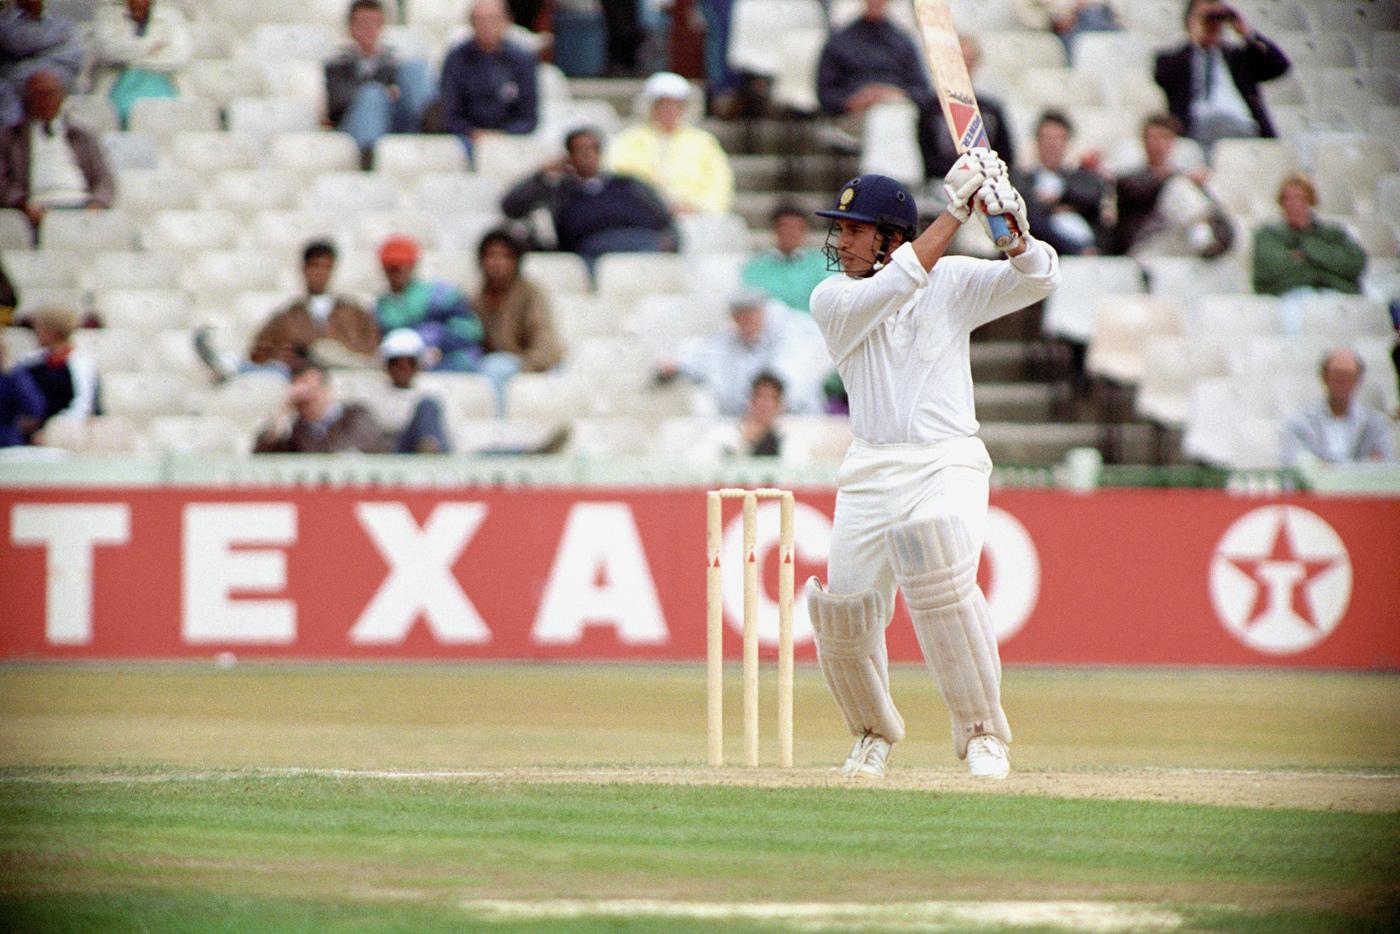 Sachin Tendulkar's first Test ton. (ESPN Cricinfo)